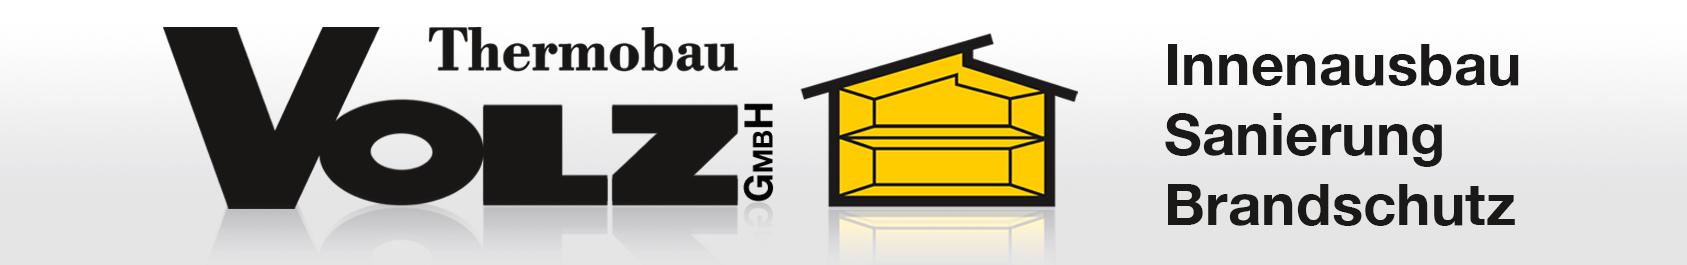 VOLZ Thermobau GmbH